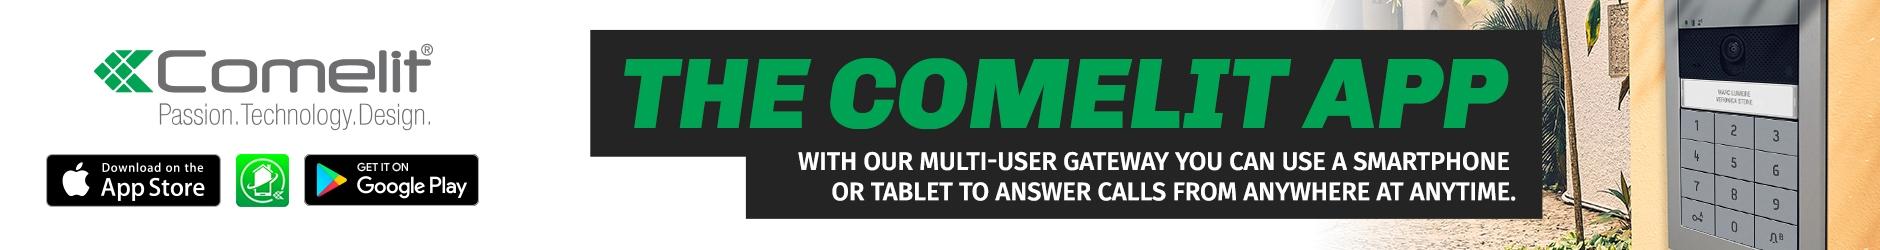 The Comlit App